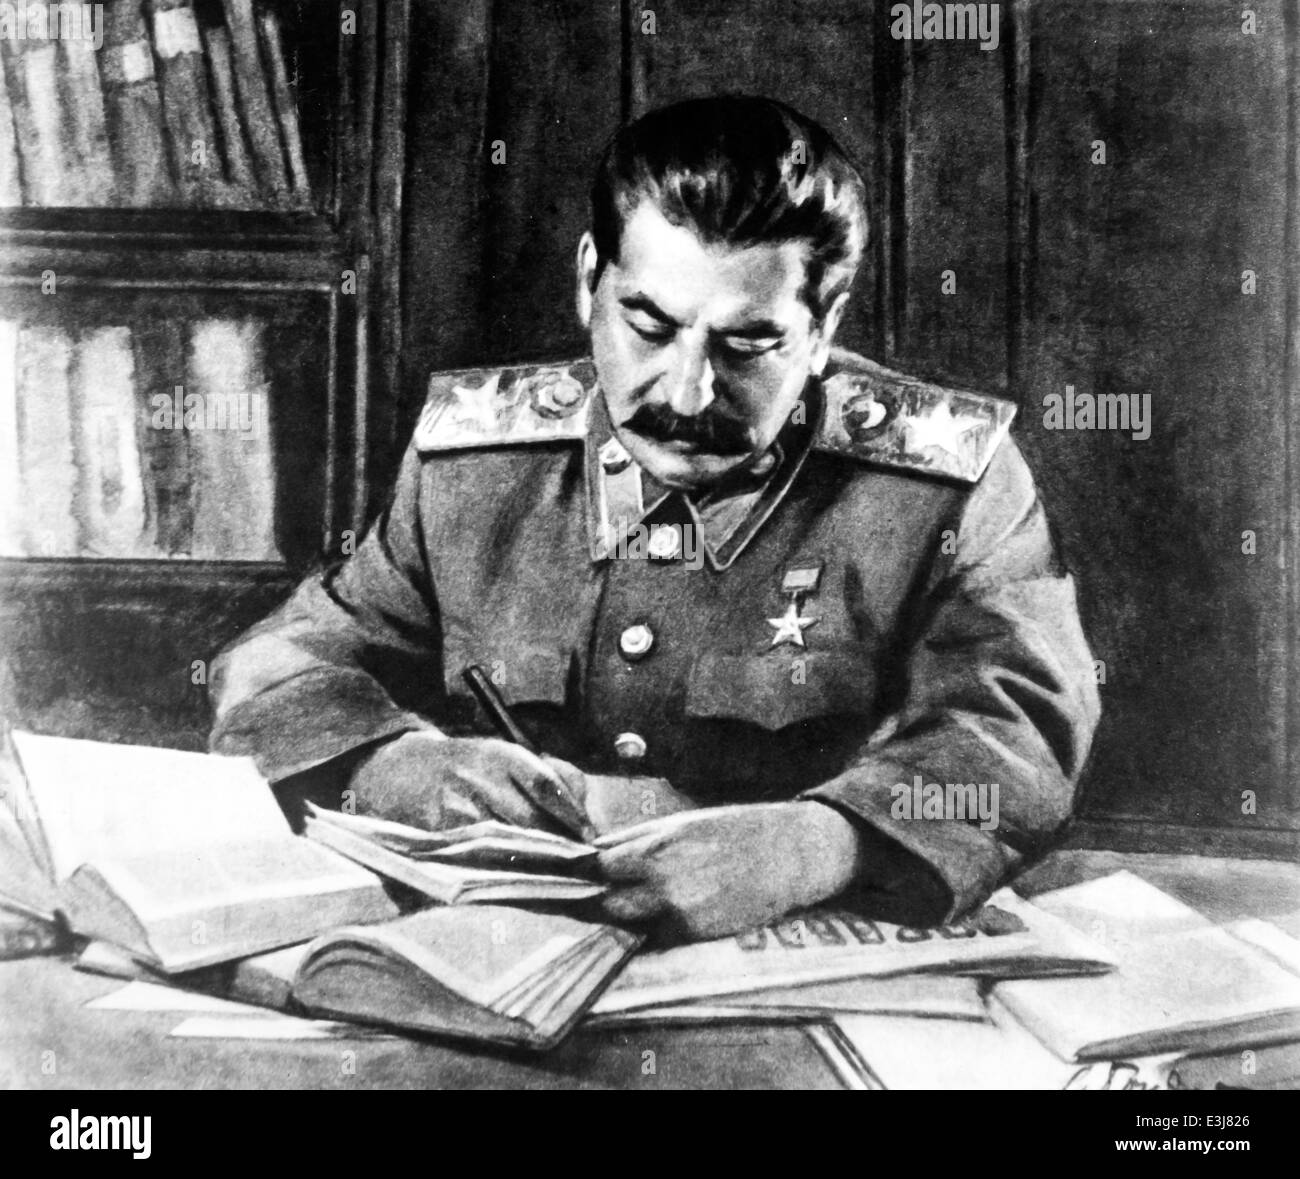 Joseph Stalin,1943 - Stock Image